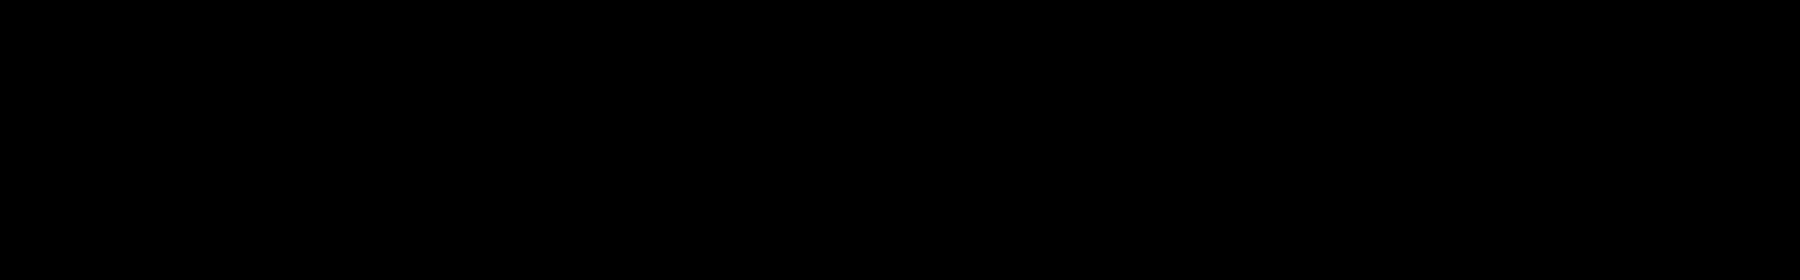 MELODIC ESSENTIALS audio waveform